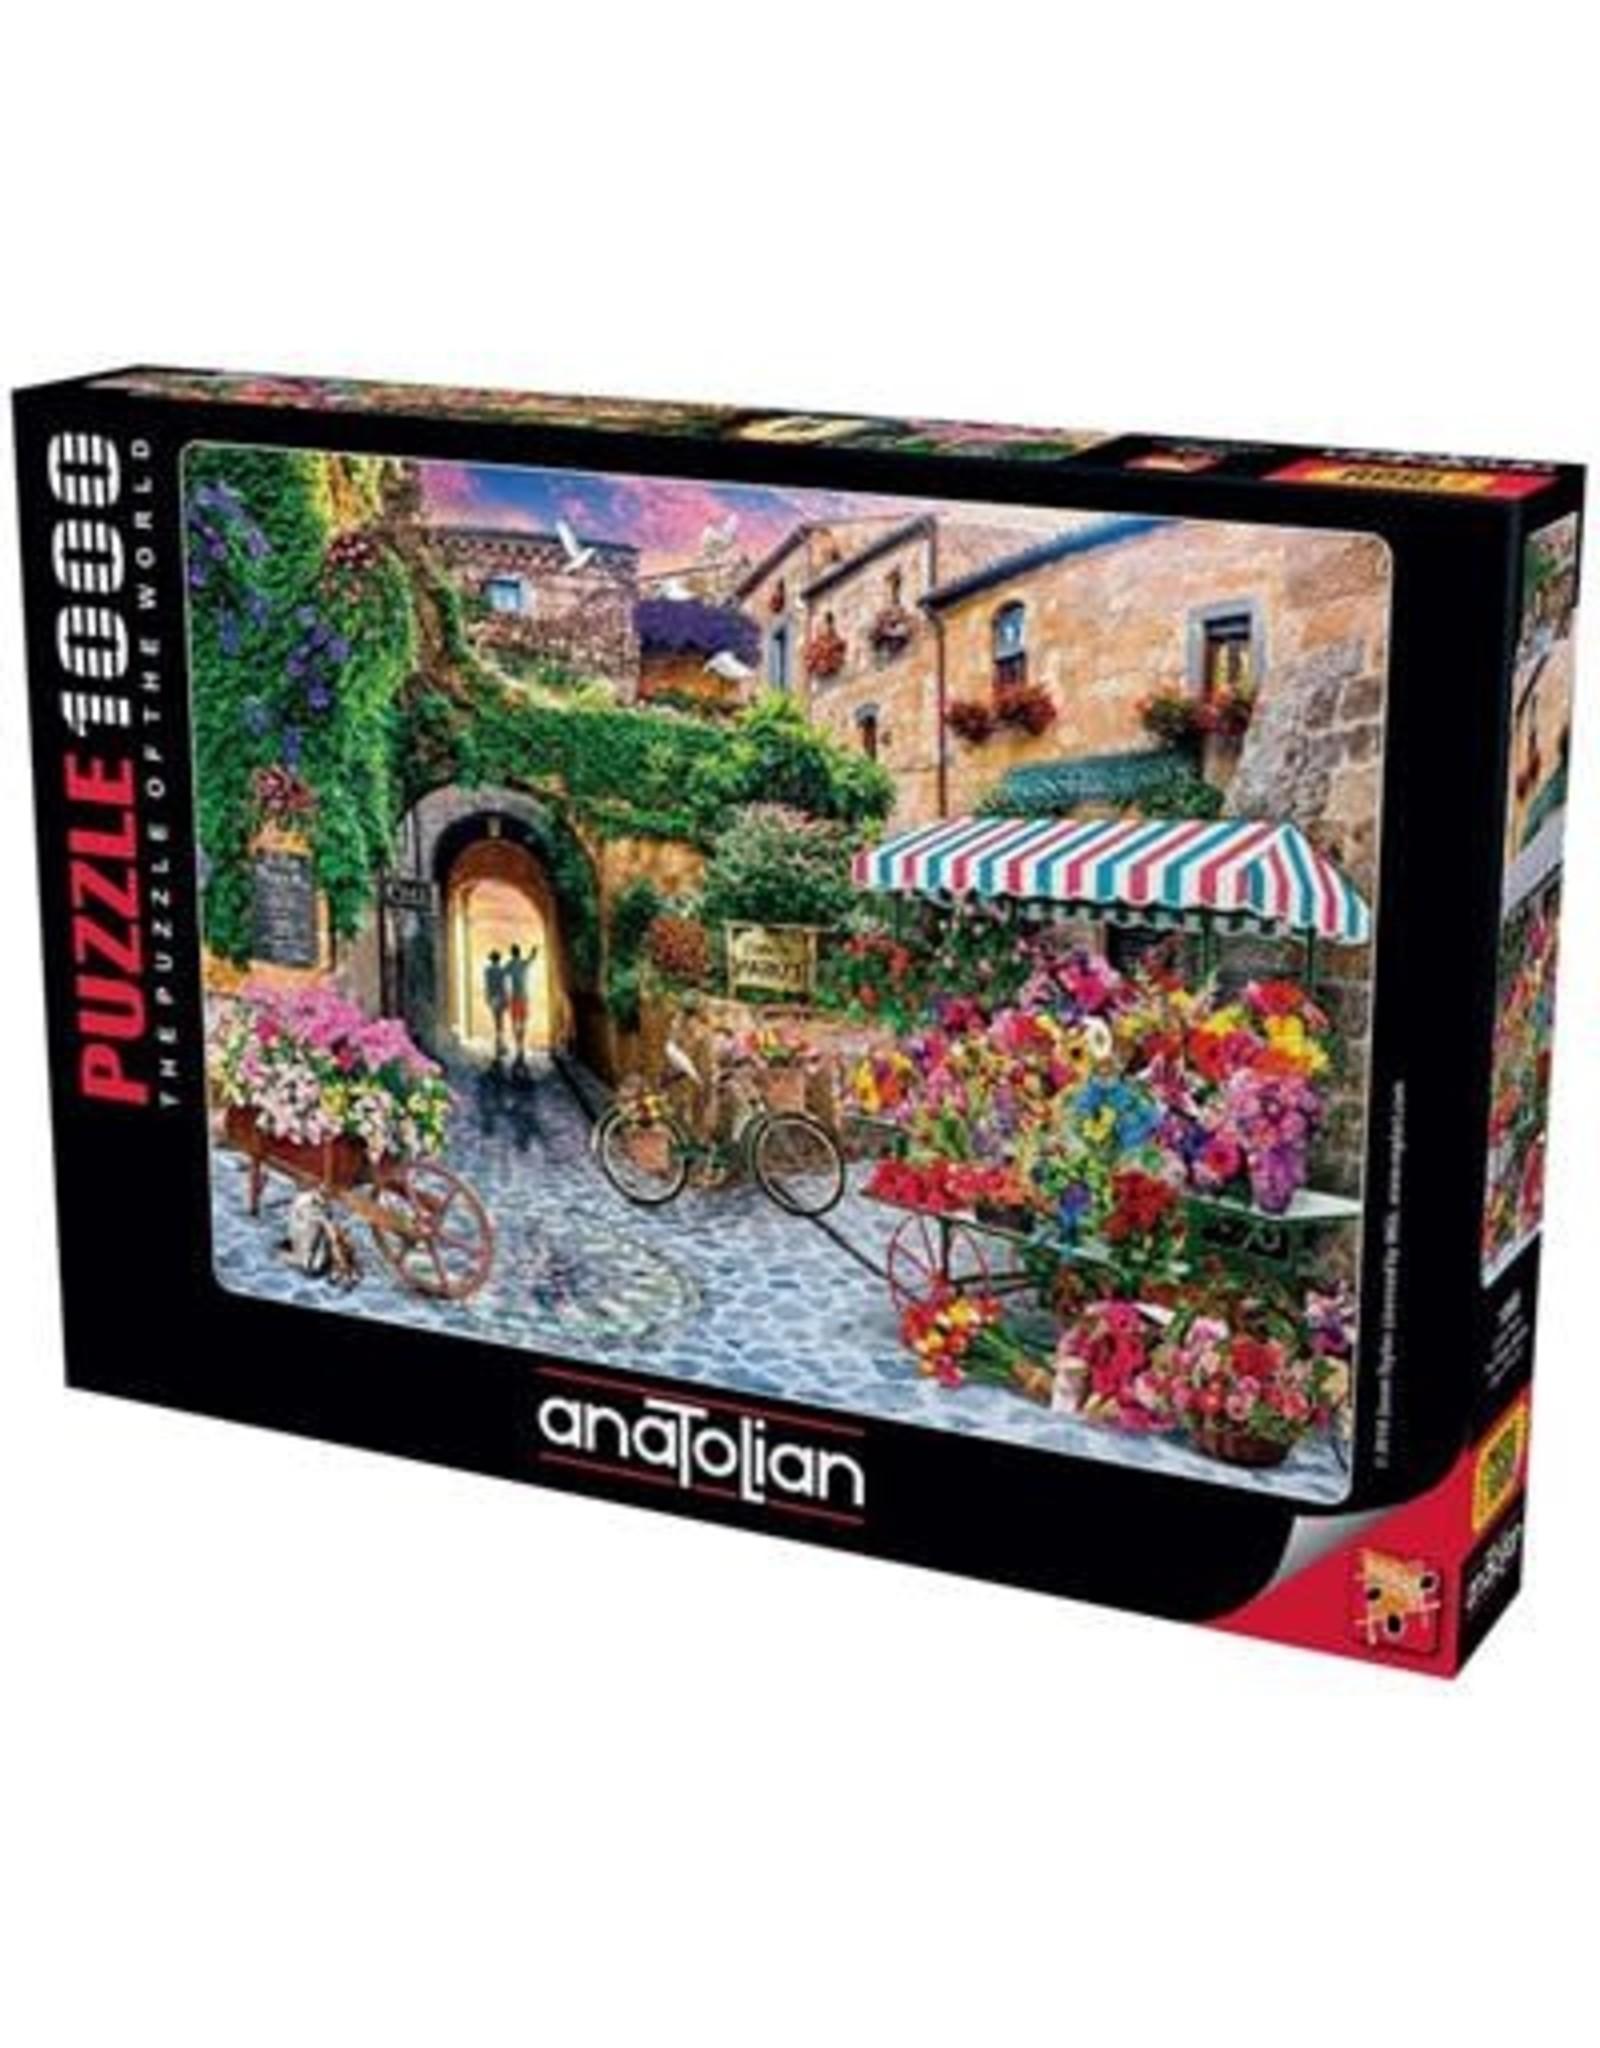 Anatolian 1000PC PUZZLE - THE FLOWER MARKET